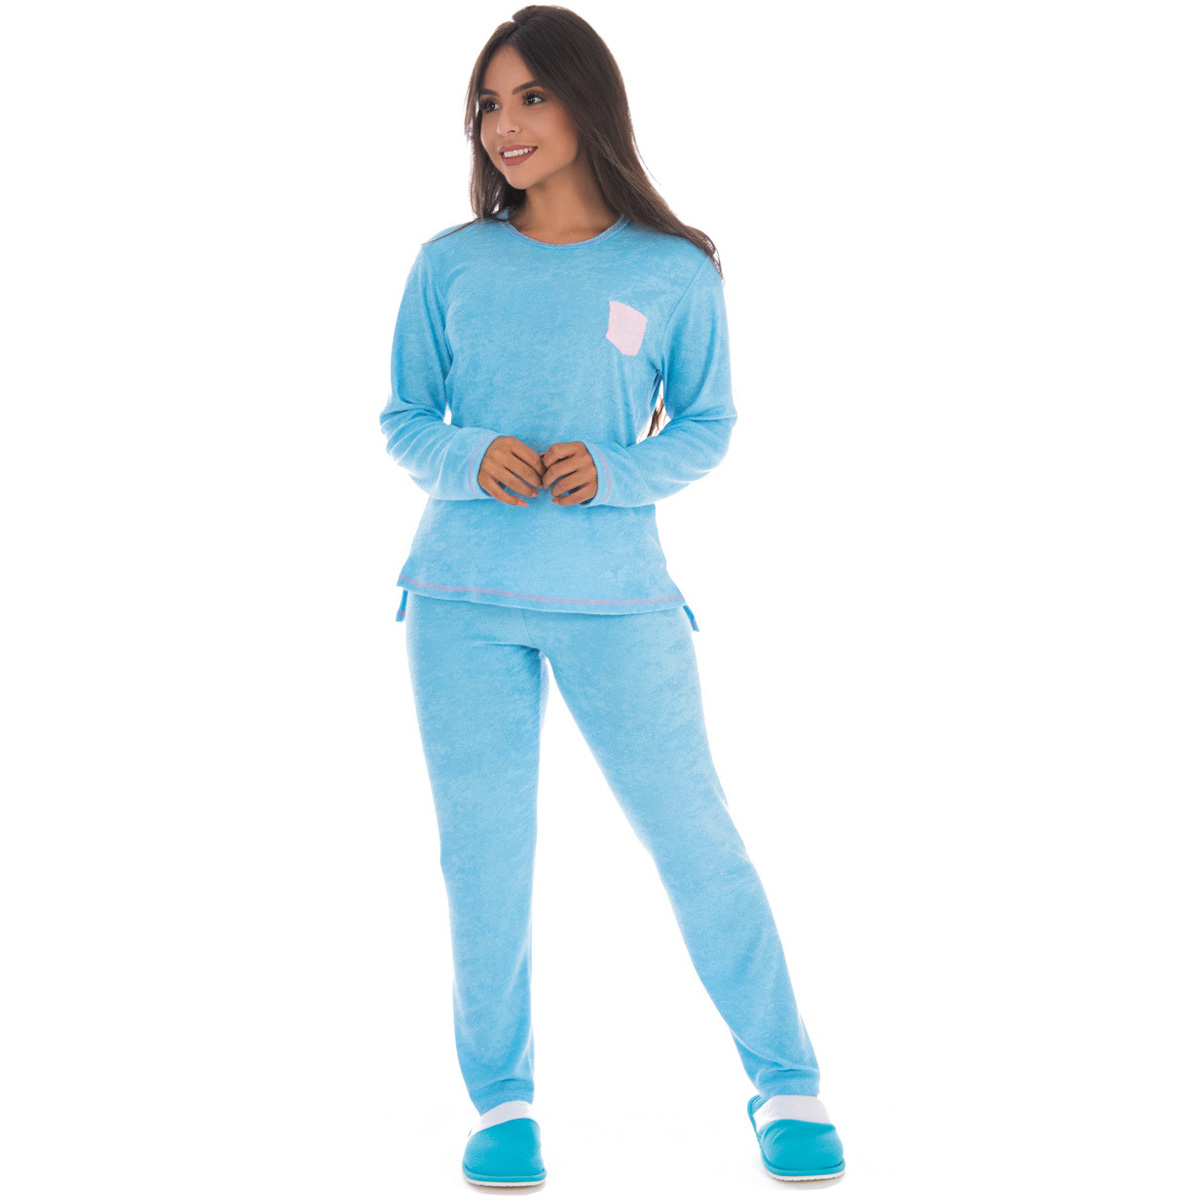 Pijama feminino de inverno plush BOLSINHO Victory